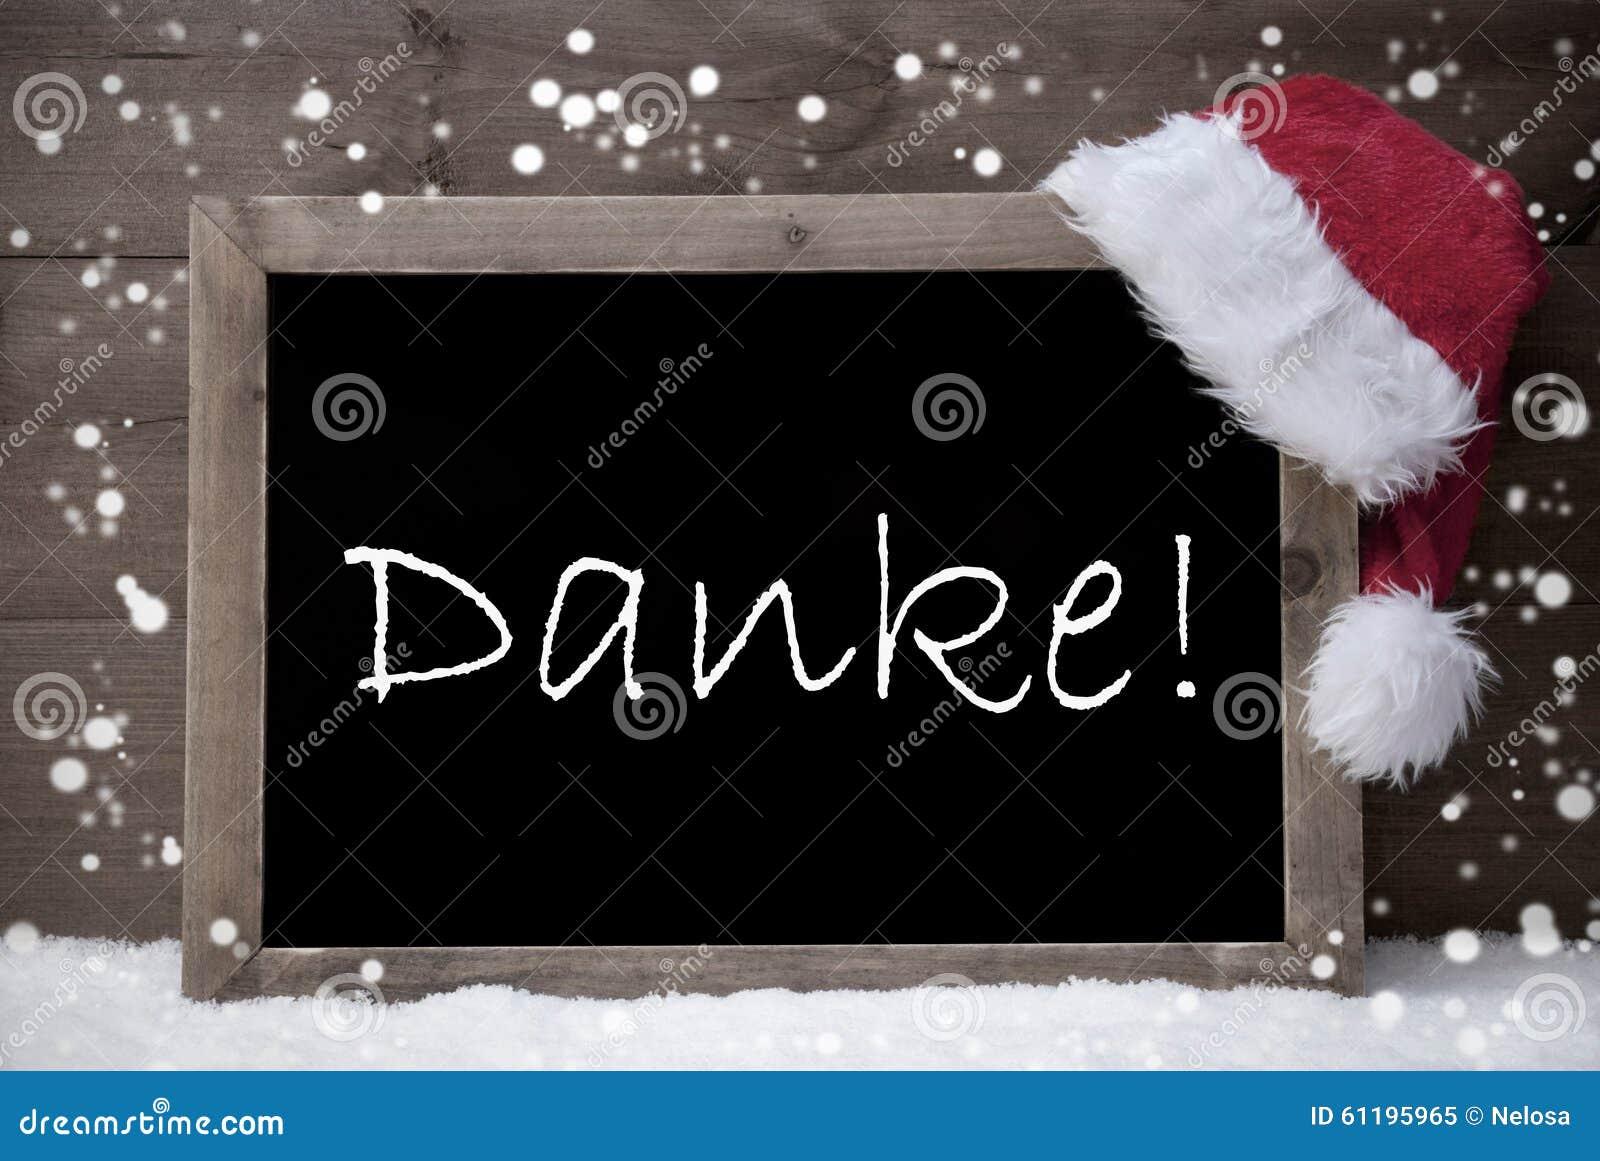 Gray Christmas Card, Chalkboard, Danke Mean Thank You, Snow Stock ...